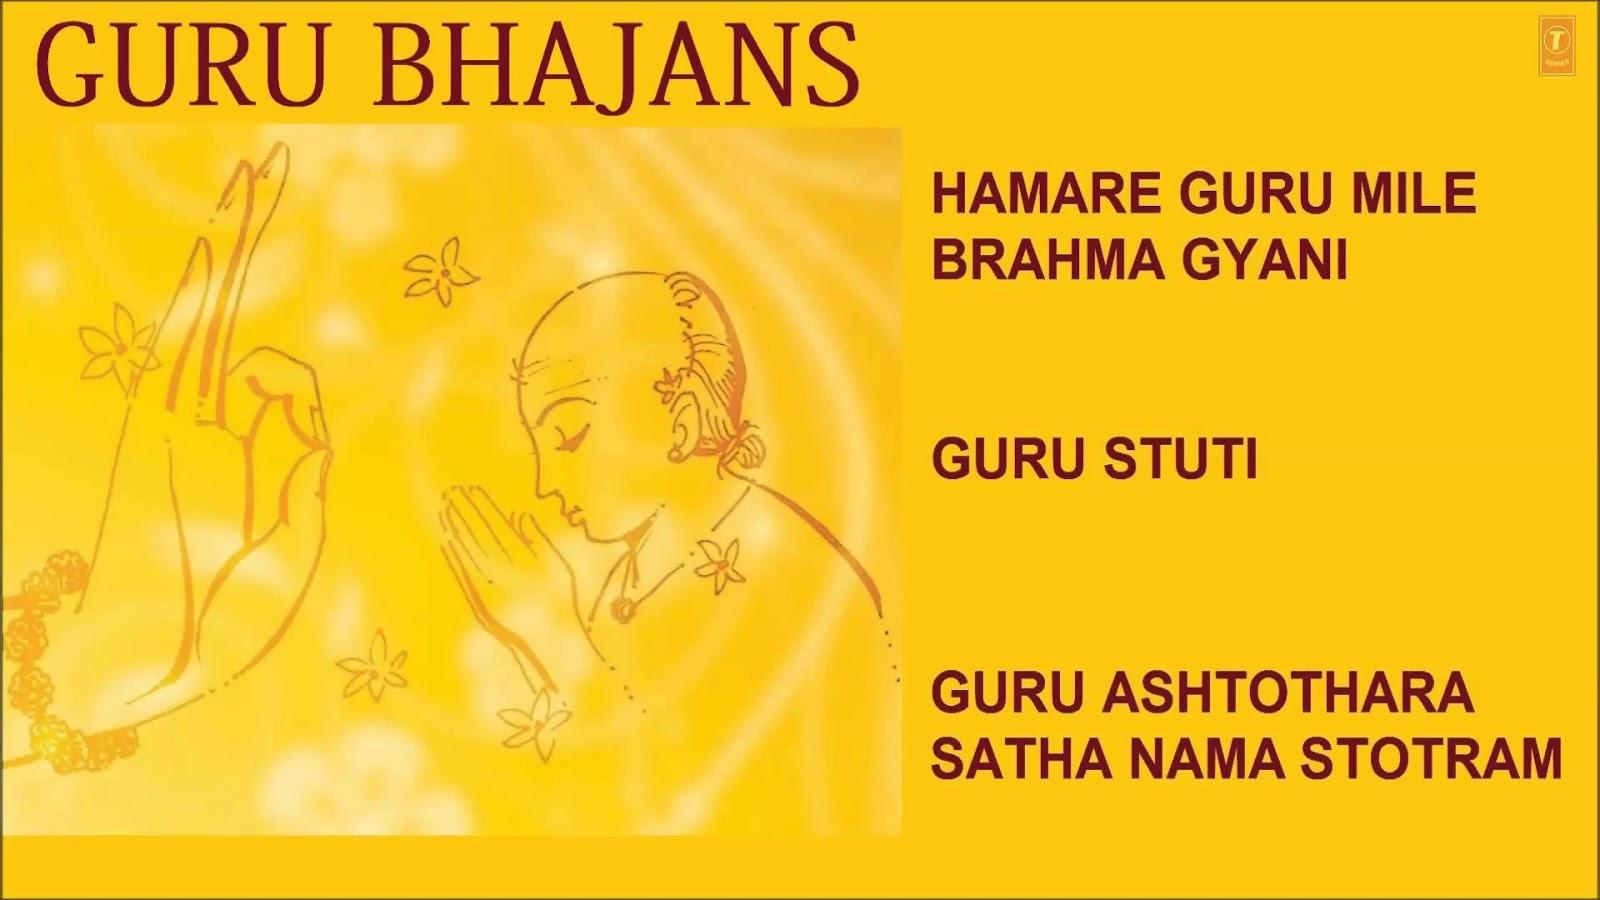 {2018} Guru Purnima Images Free Download for Facebook & WhatsApp